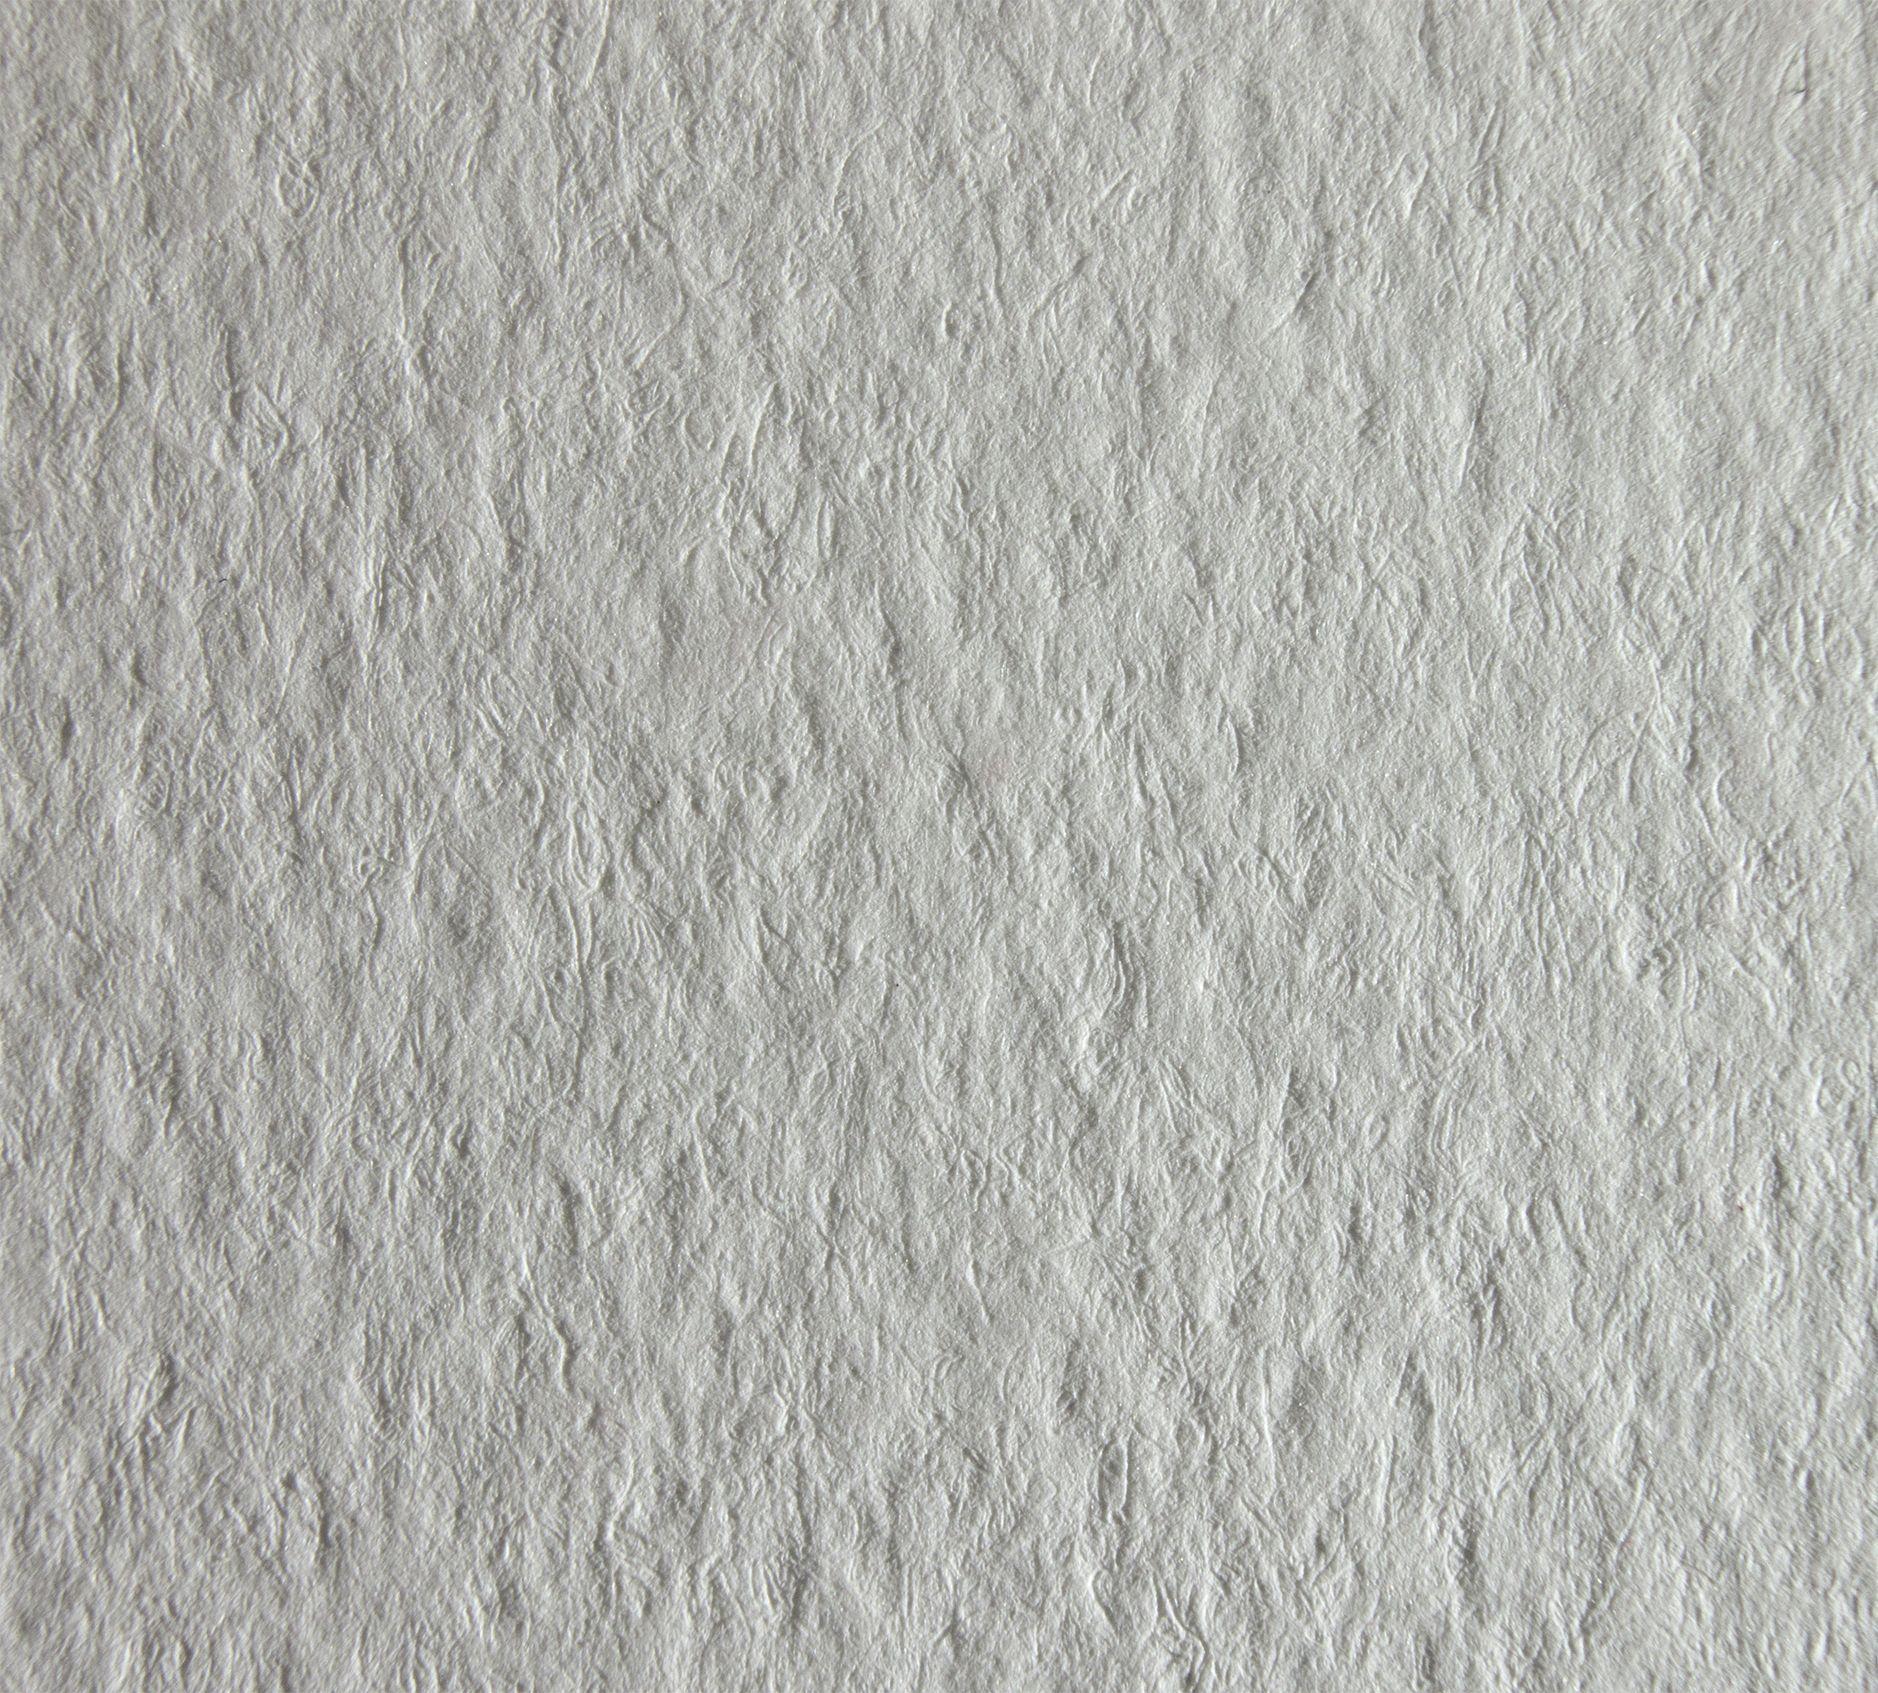 papel textura acuarela